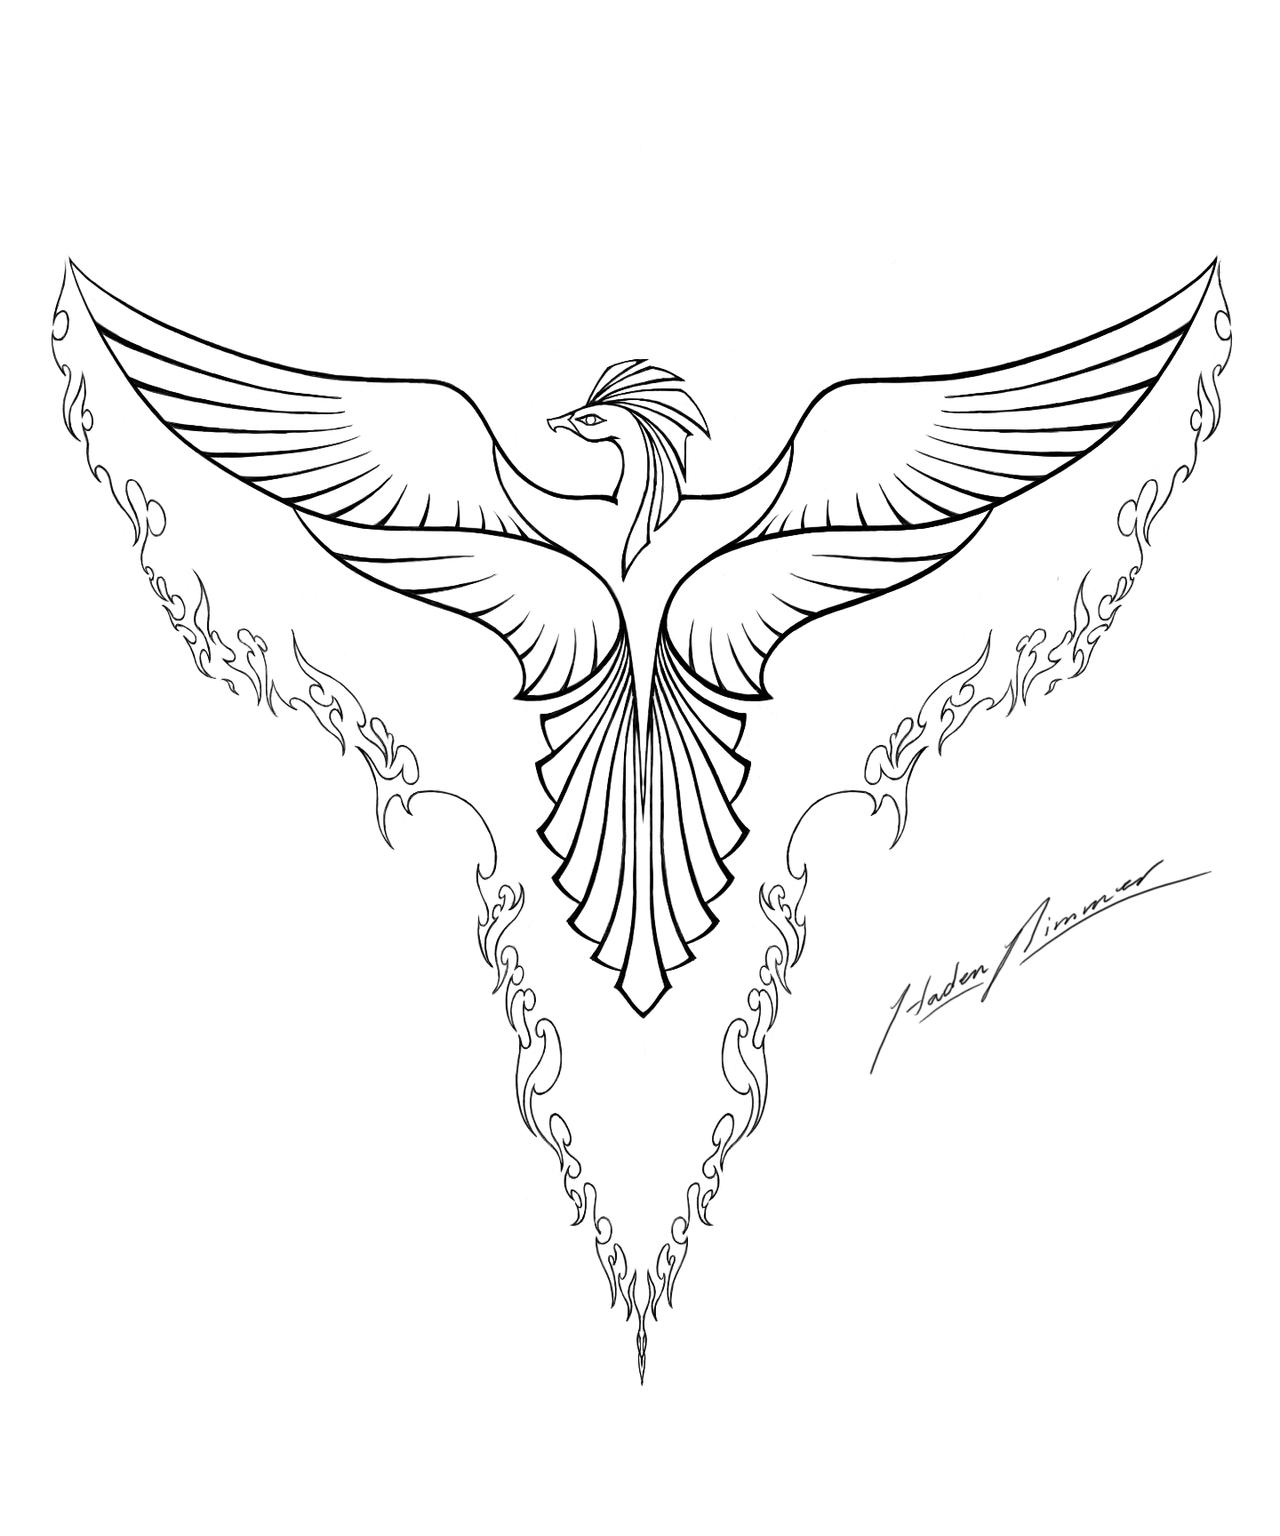 bird coloring pages rspb shop - photo#18